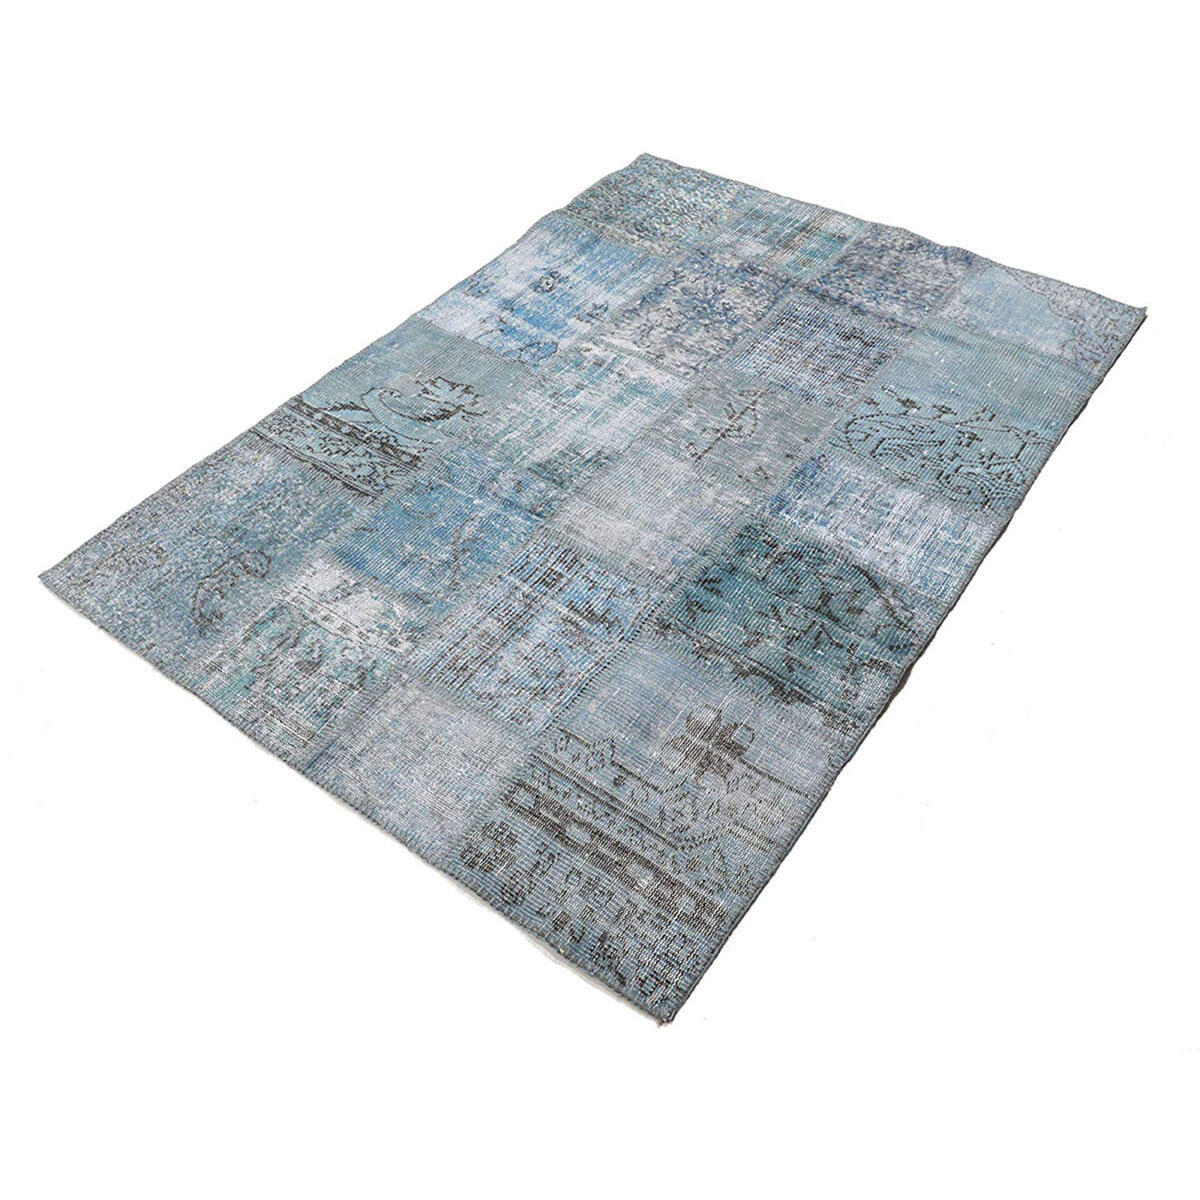 Tappeto Anatolian patchwork in lana, grigio, 60x200 - 5